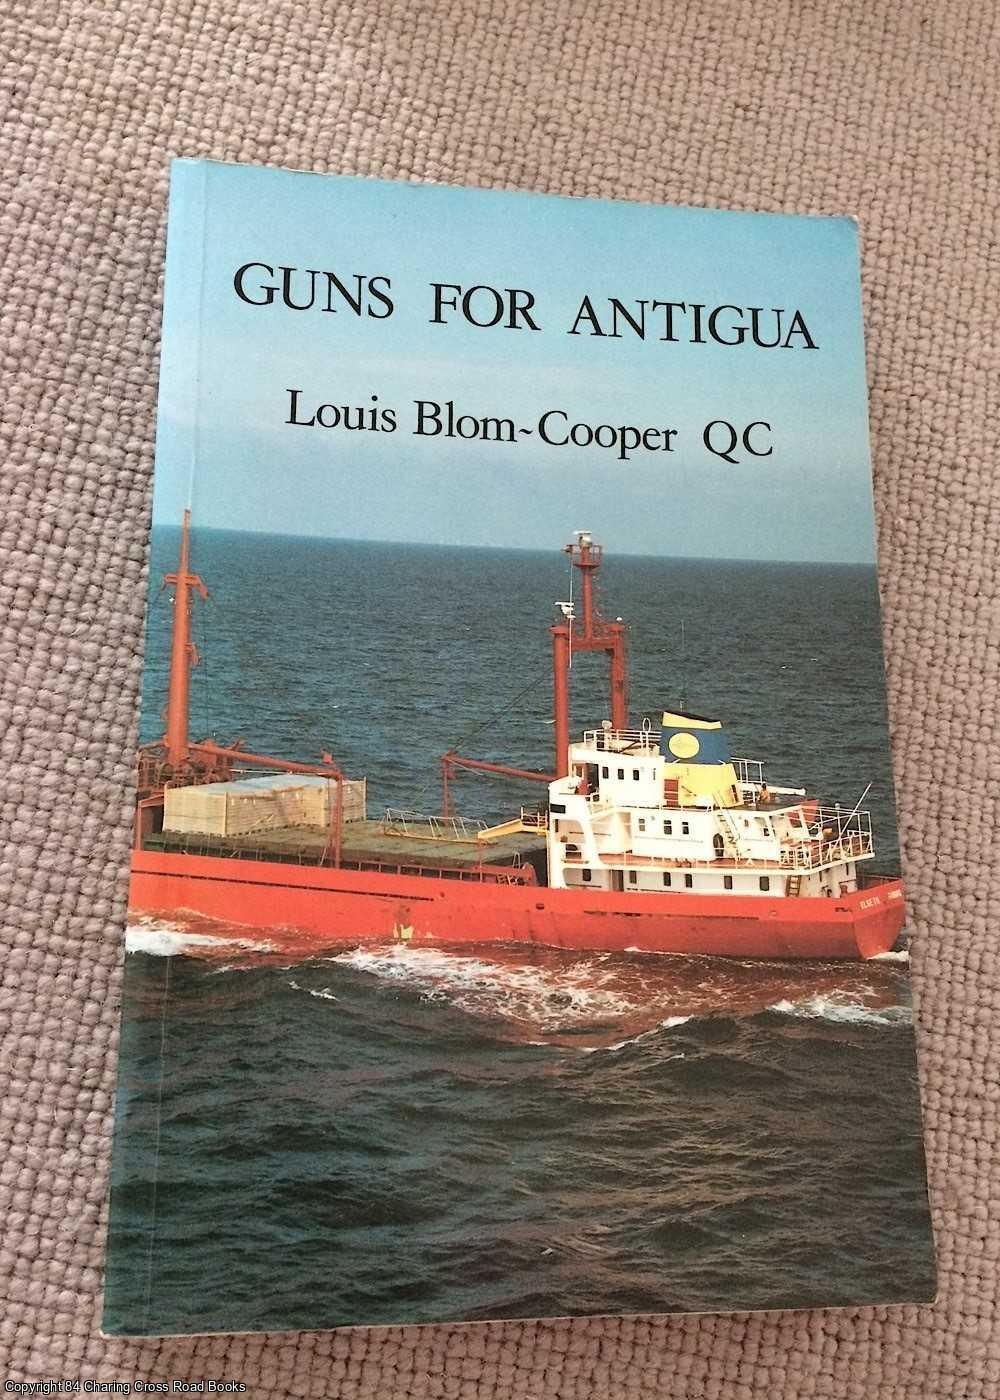 BLOM-COOPER, LOUIS - Guns for Antigua